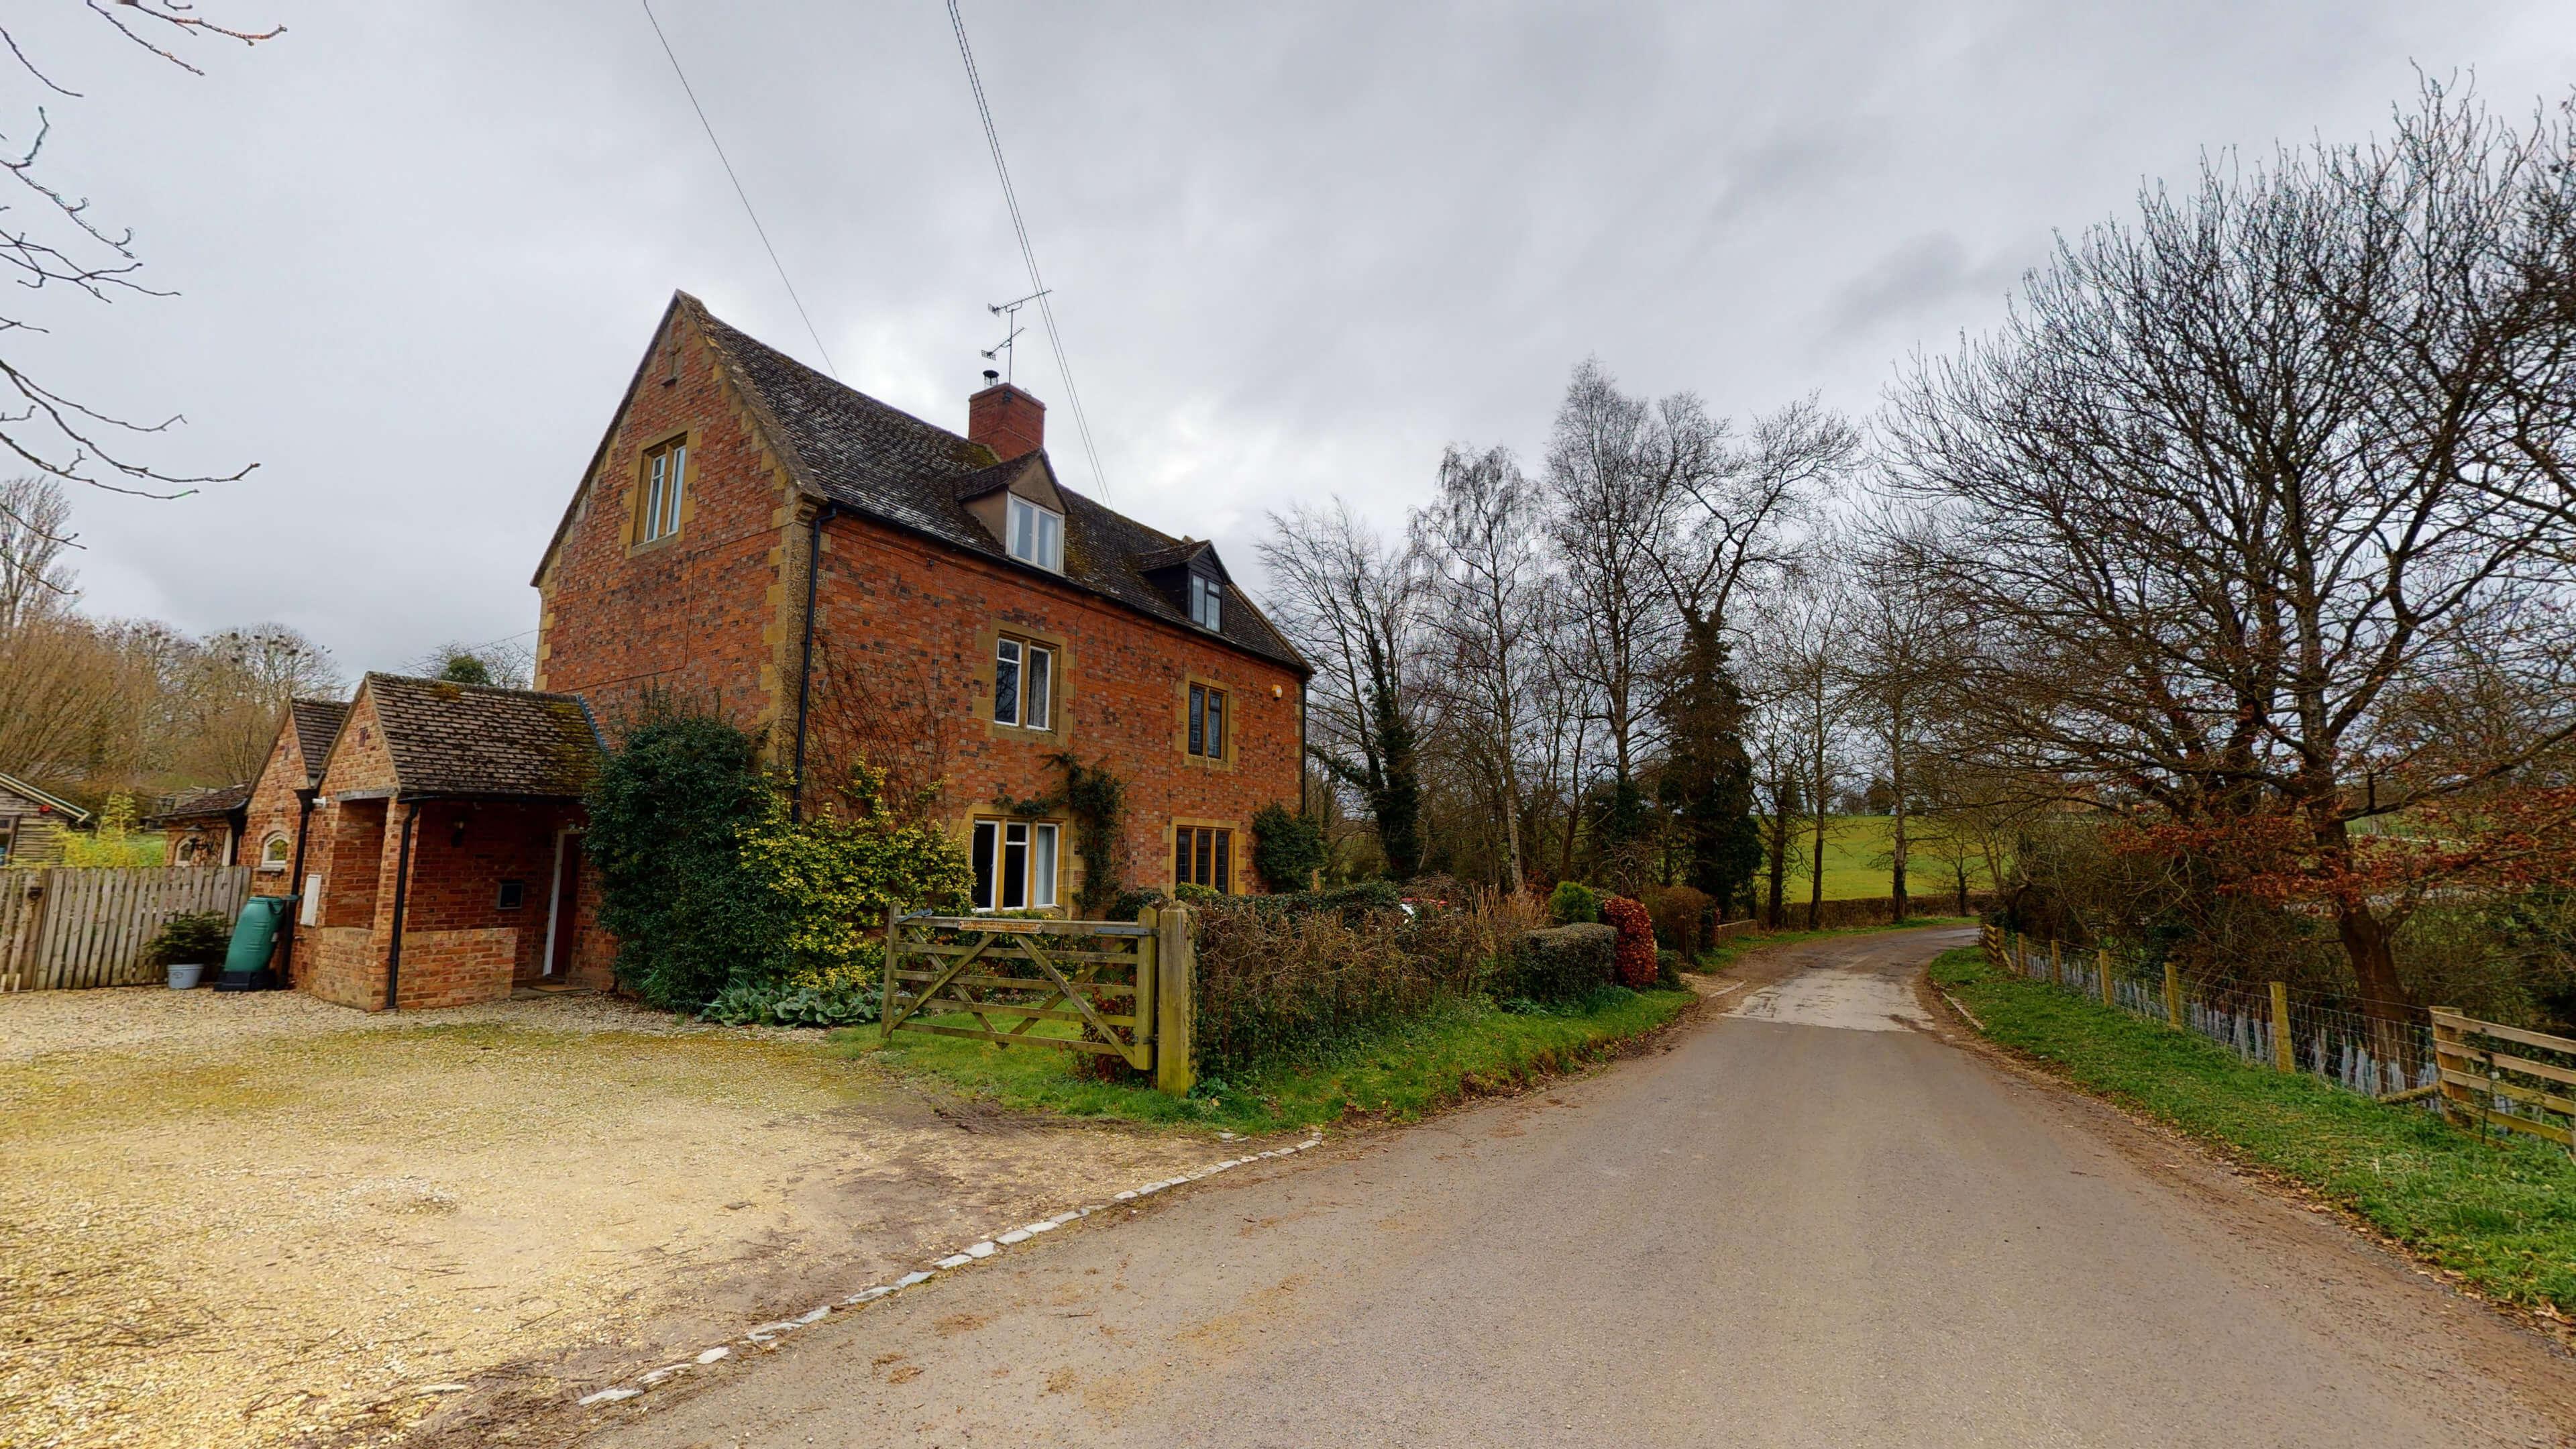 Orchard Cottage Orchard Cottage